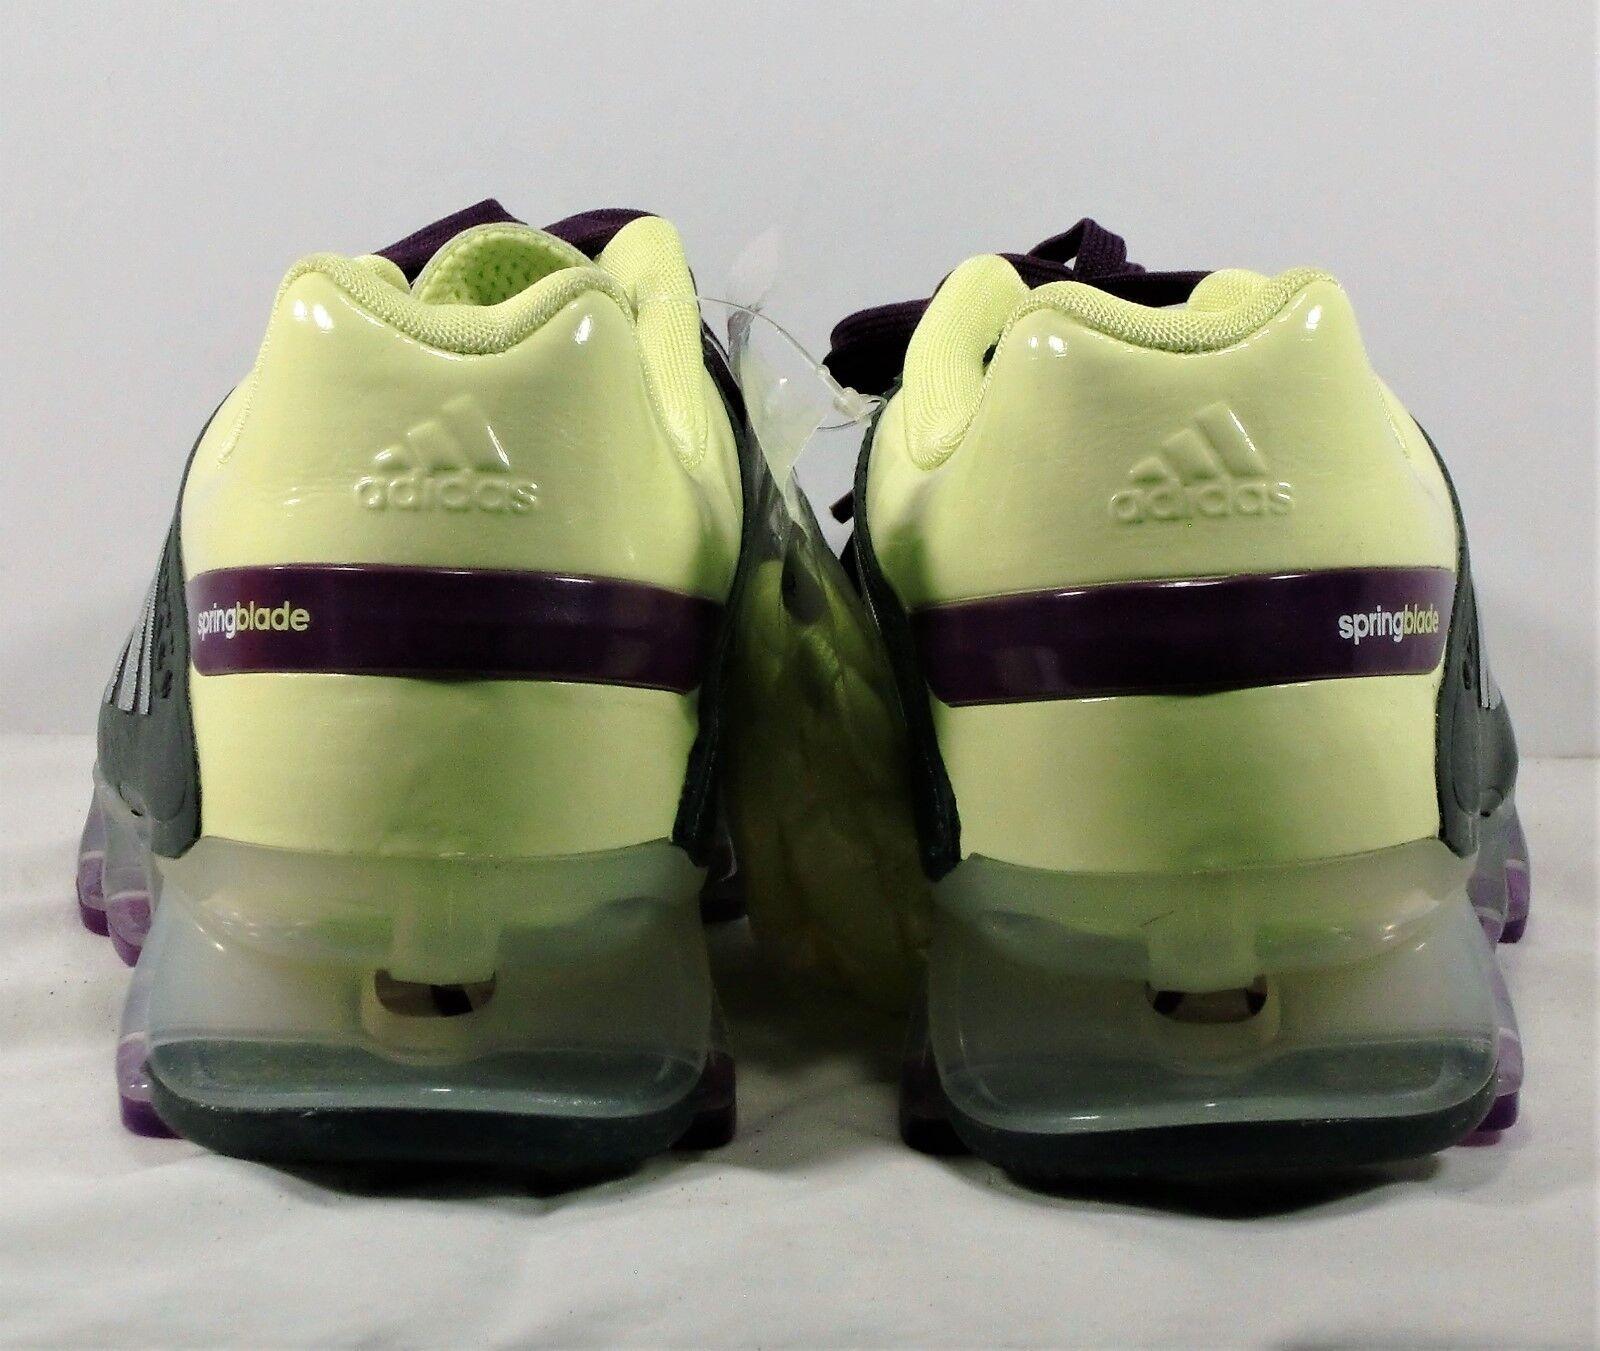 Adidas Springblade Razor Glow & Metallic Metallic Metallic Silver Running shoes Sz 7.5 NEW G97688 4af182